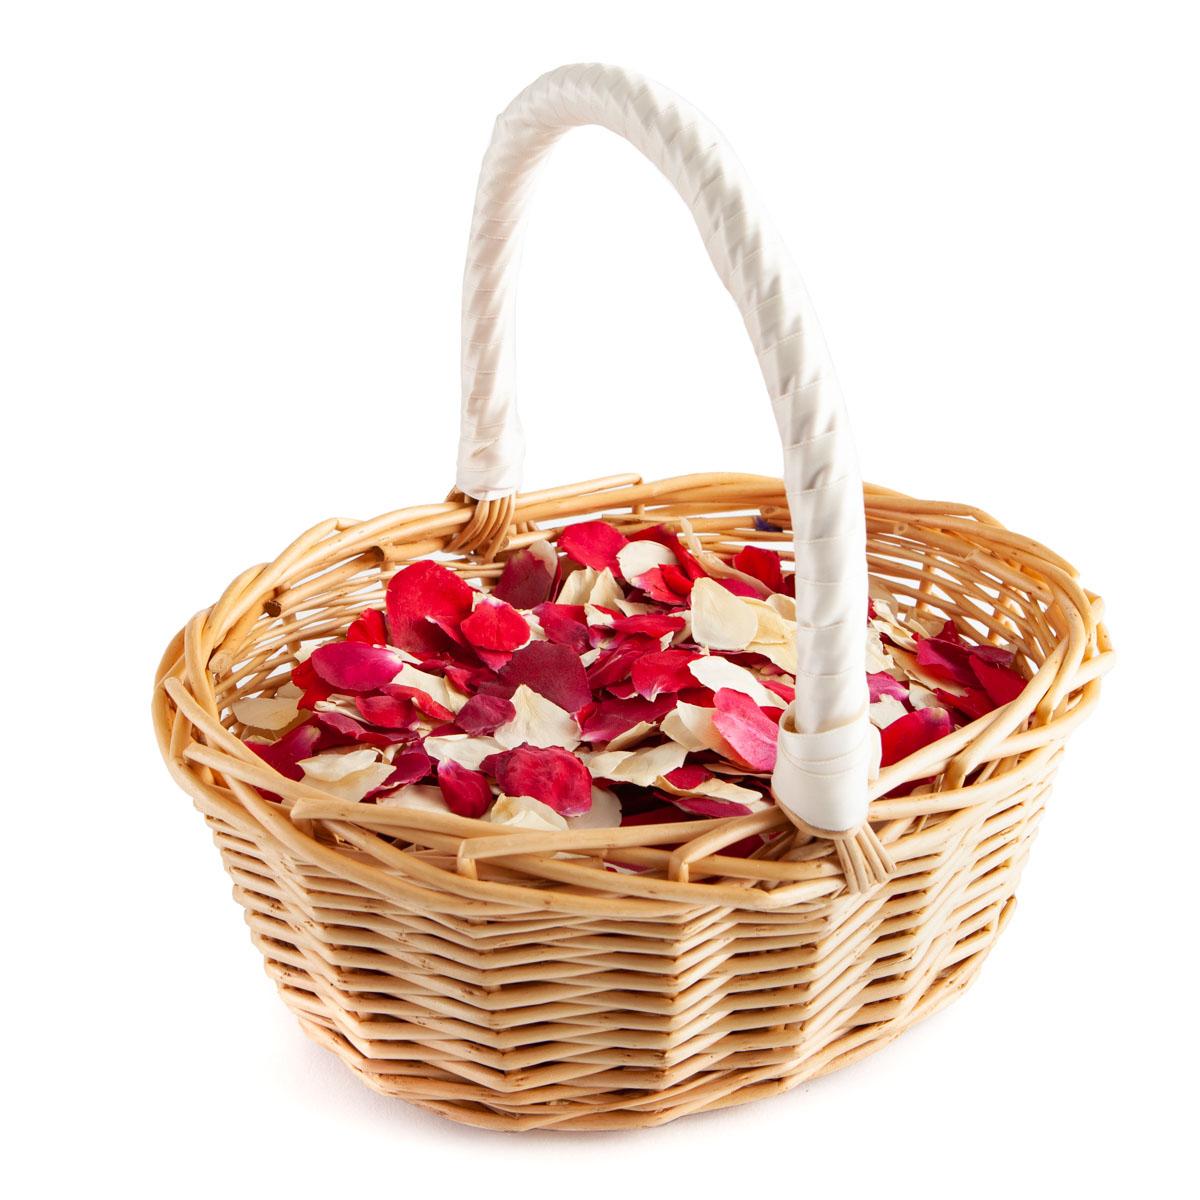 Red & Cream Rose Petals - Biodegradable Confetti - Real Flower Petal Confetti - Basket